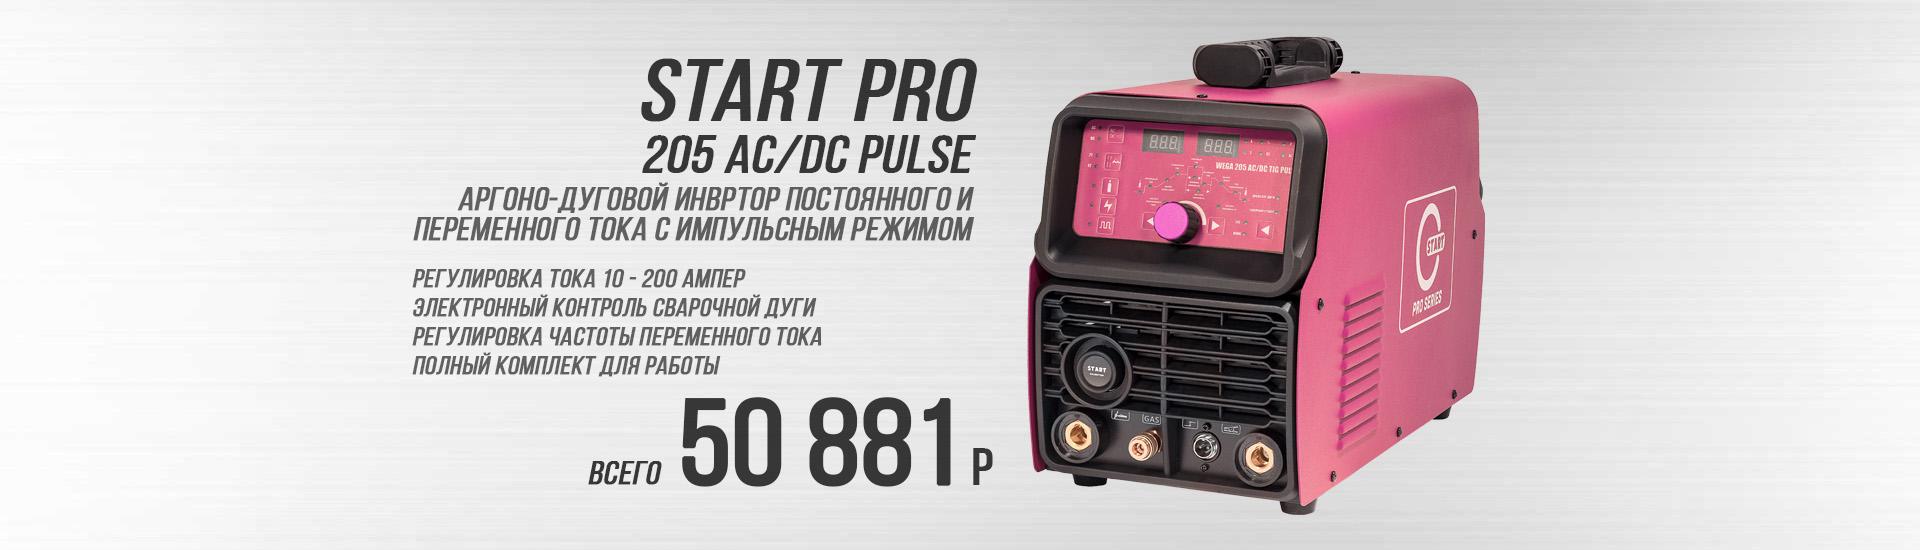 start pro tig 205 ac/dc pulse